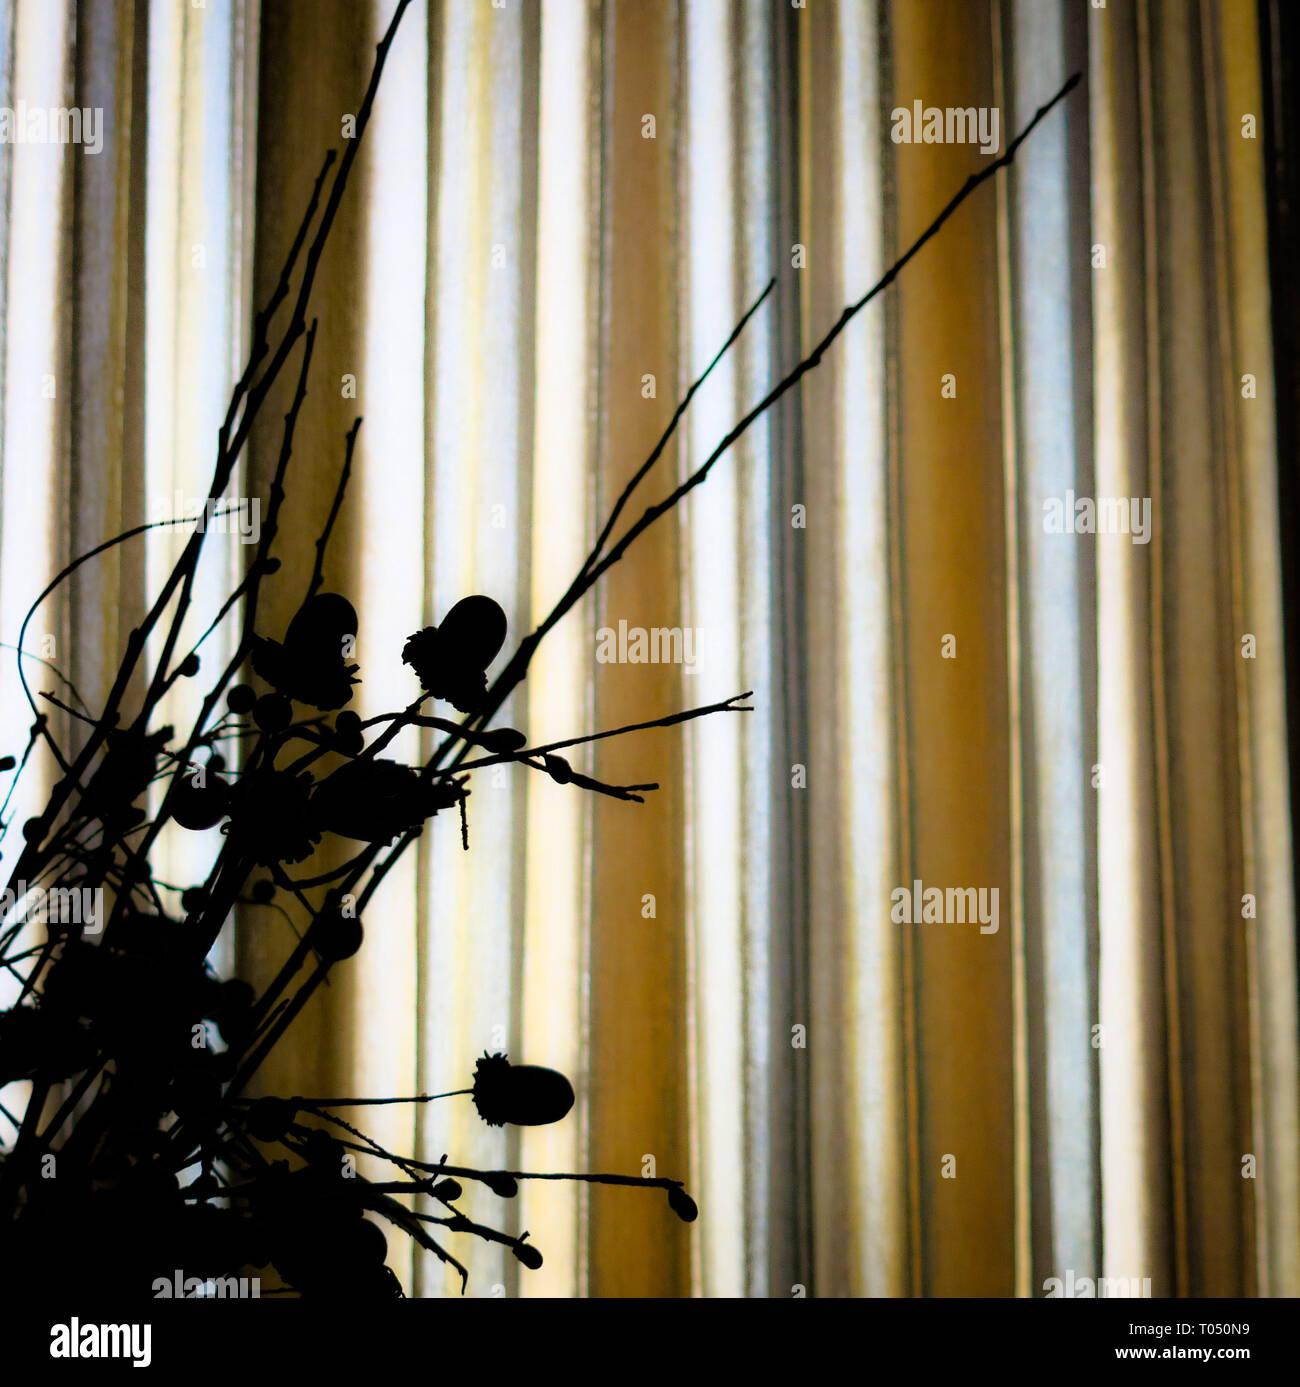 Dried ornamental plants against an illuminated curtain. - Stock Image